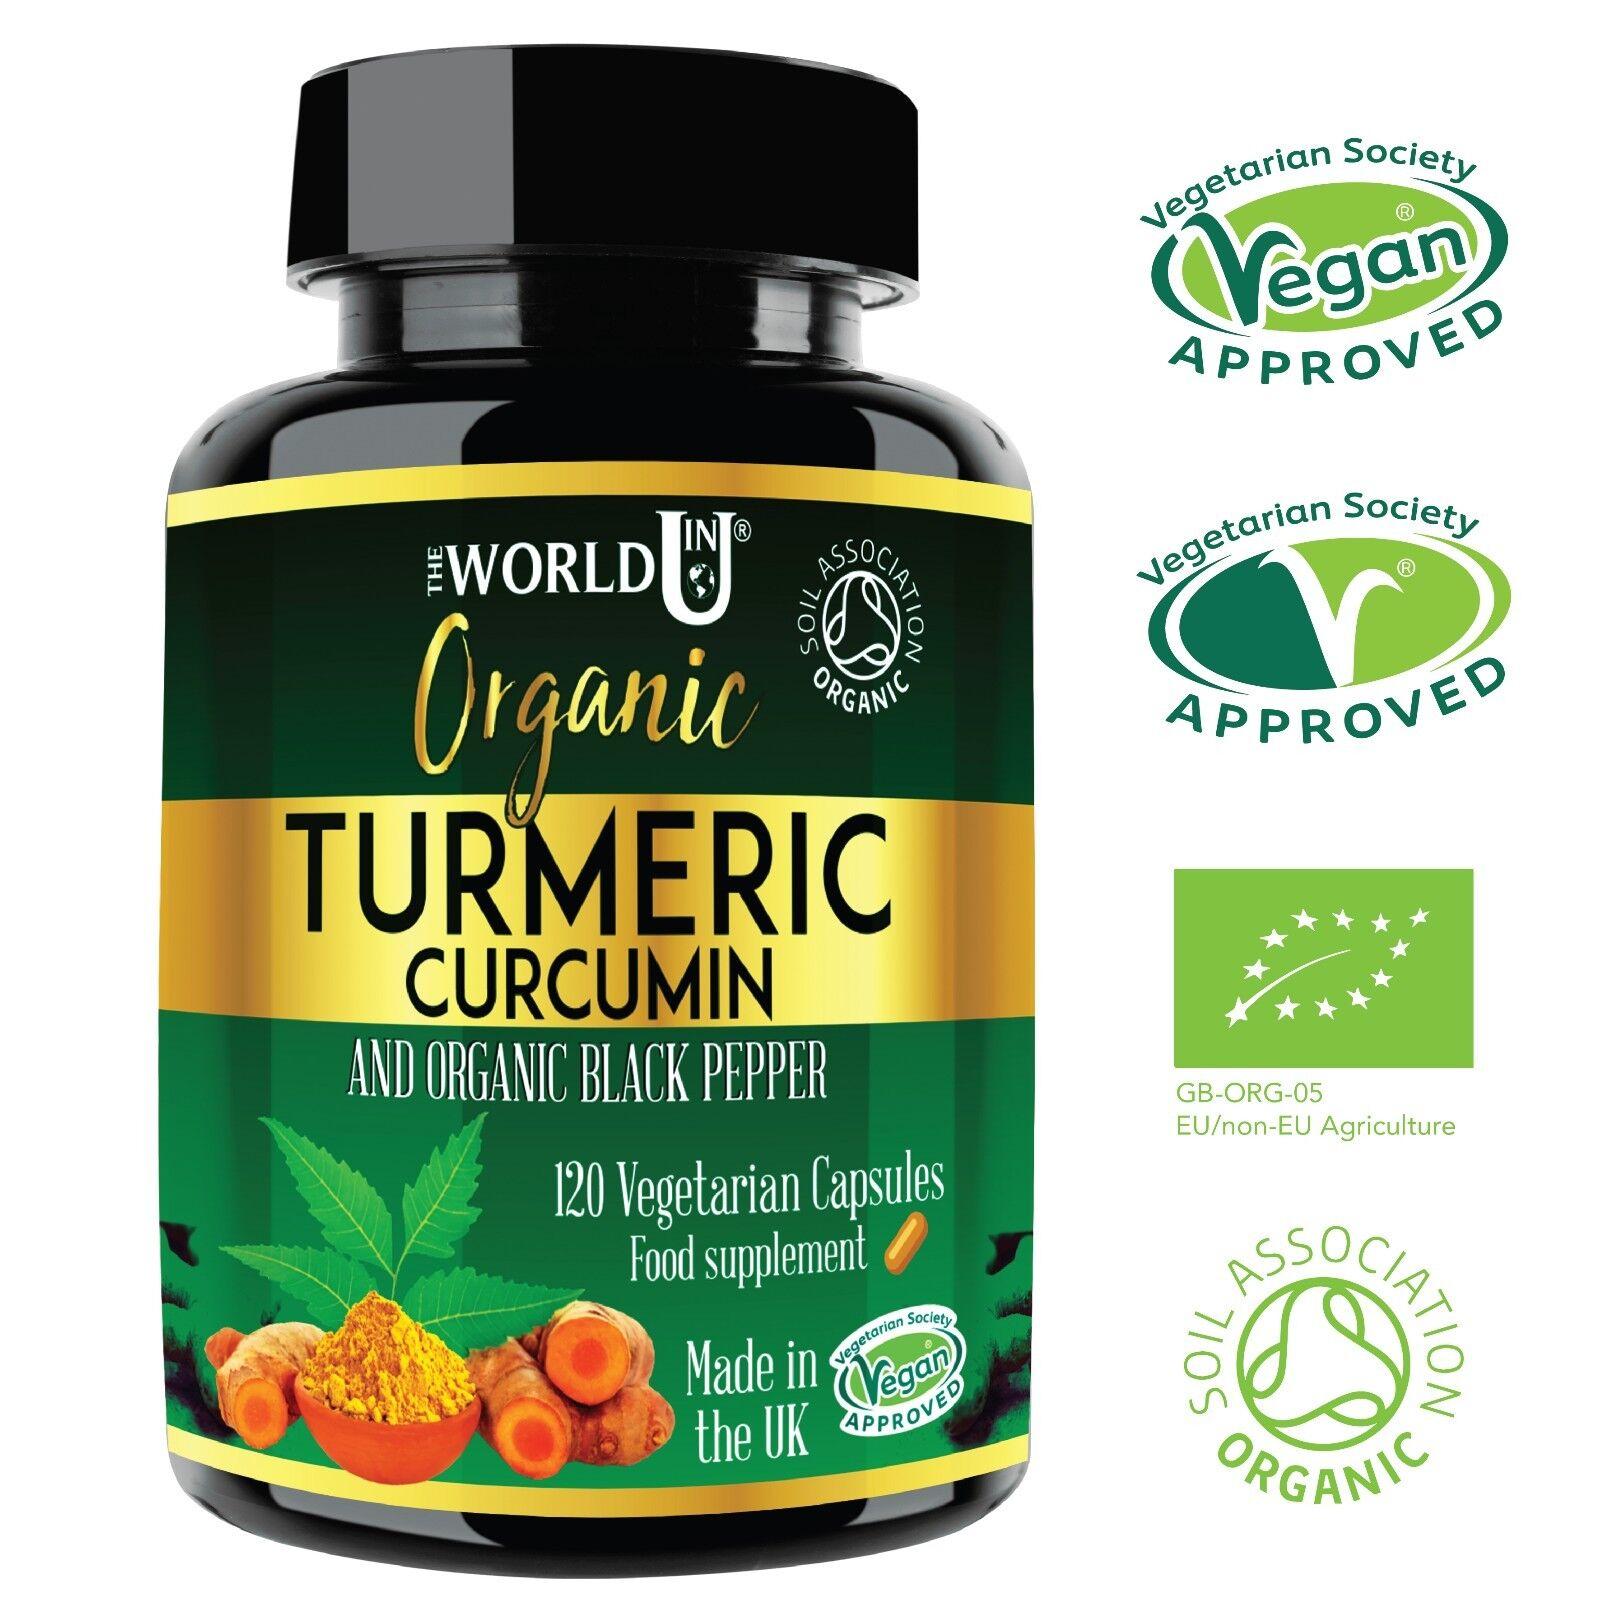 ORGANIC Turmeric Curcumin 4 MONTHS SUPPLY 120 Capsules +Black Pepper Tumeric NEW